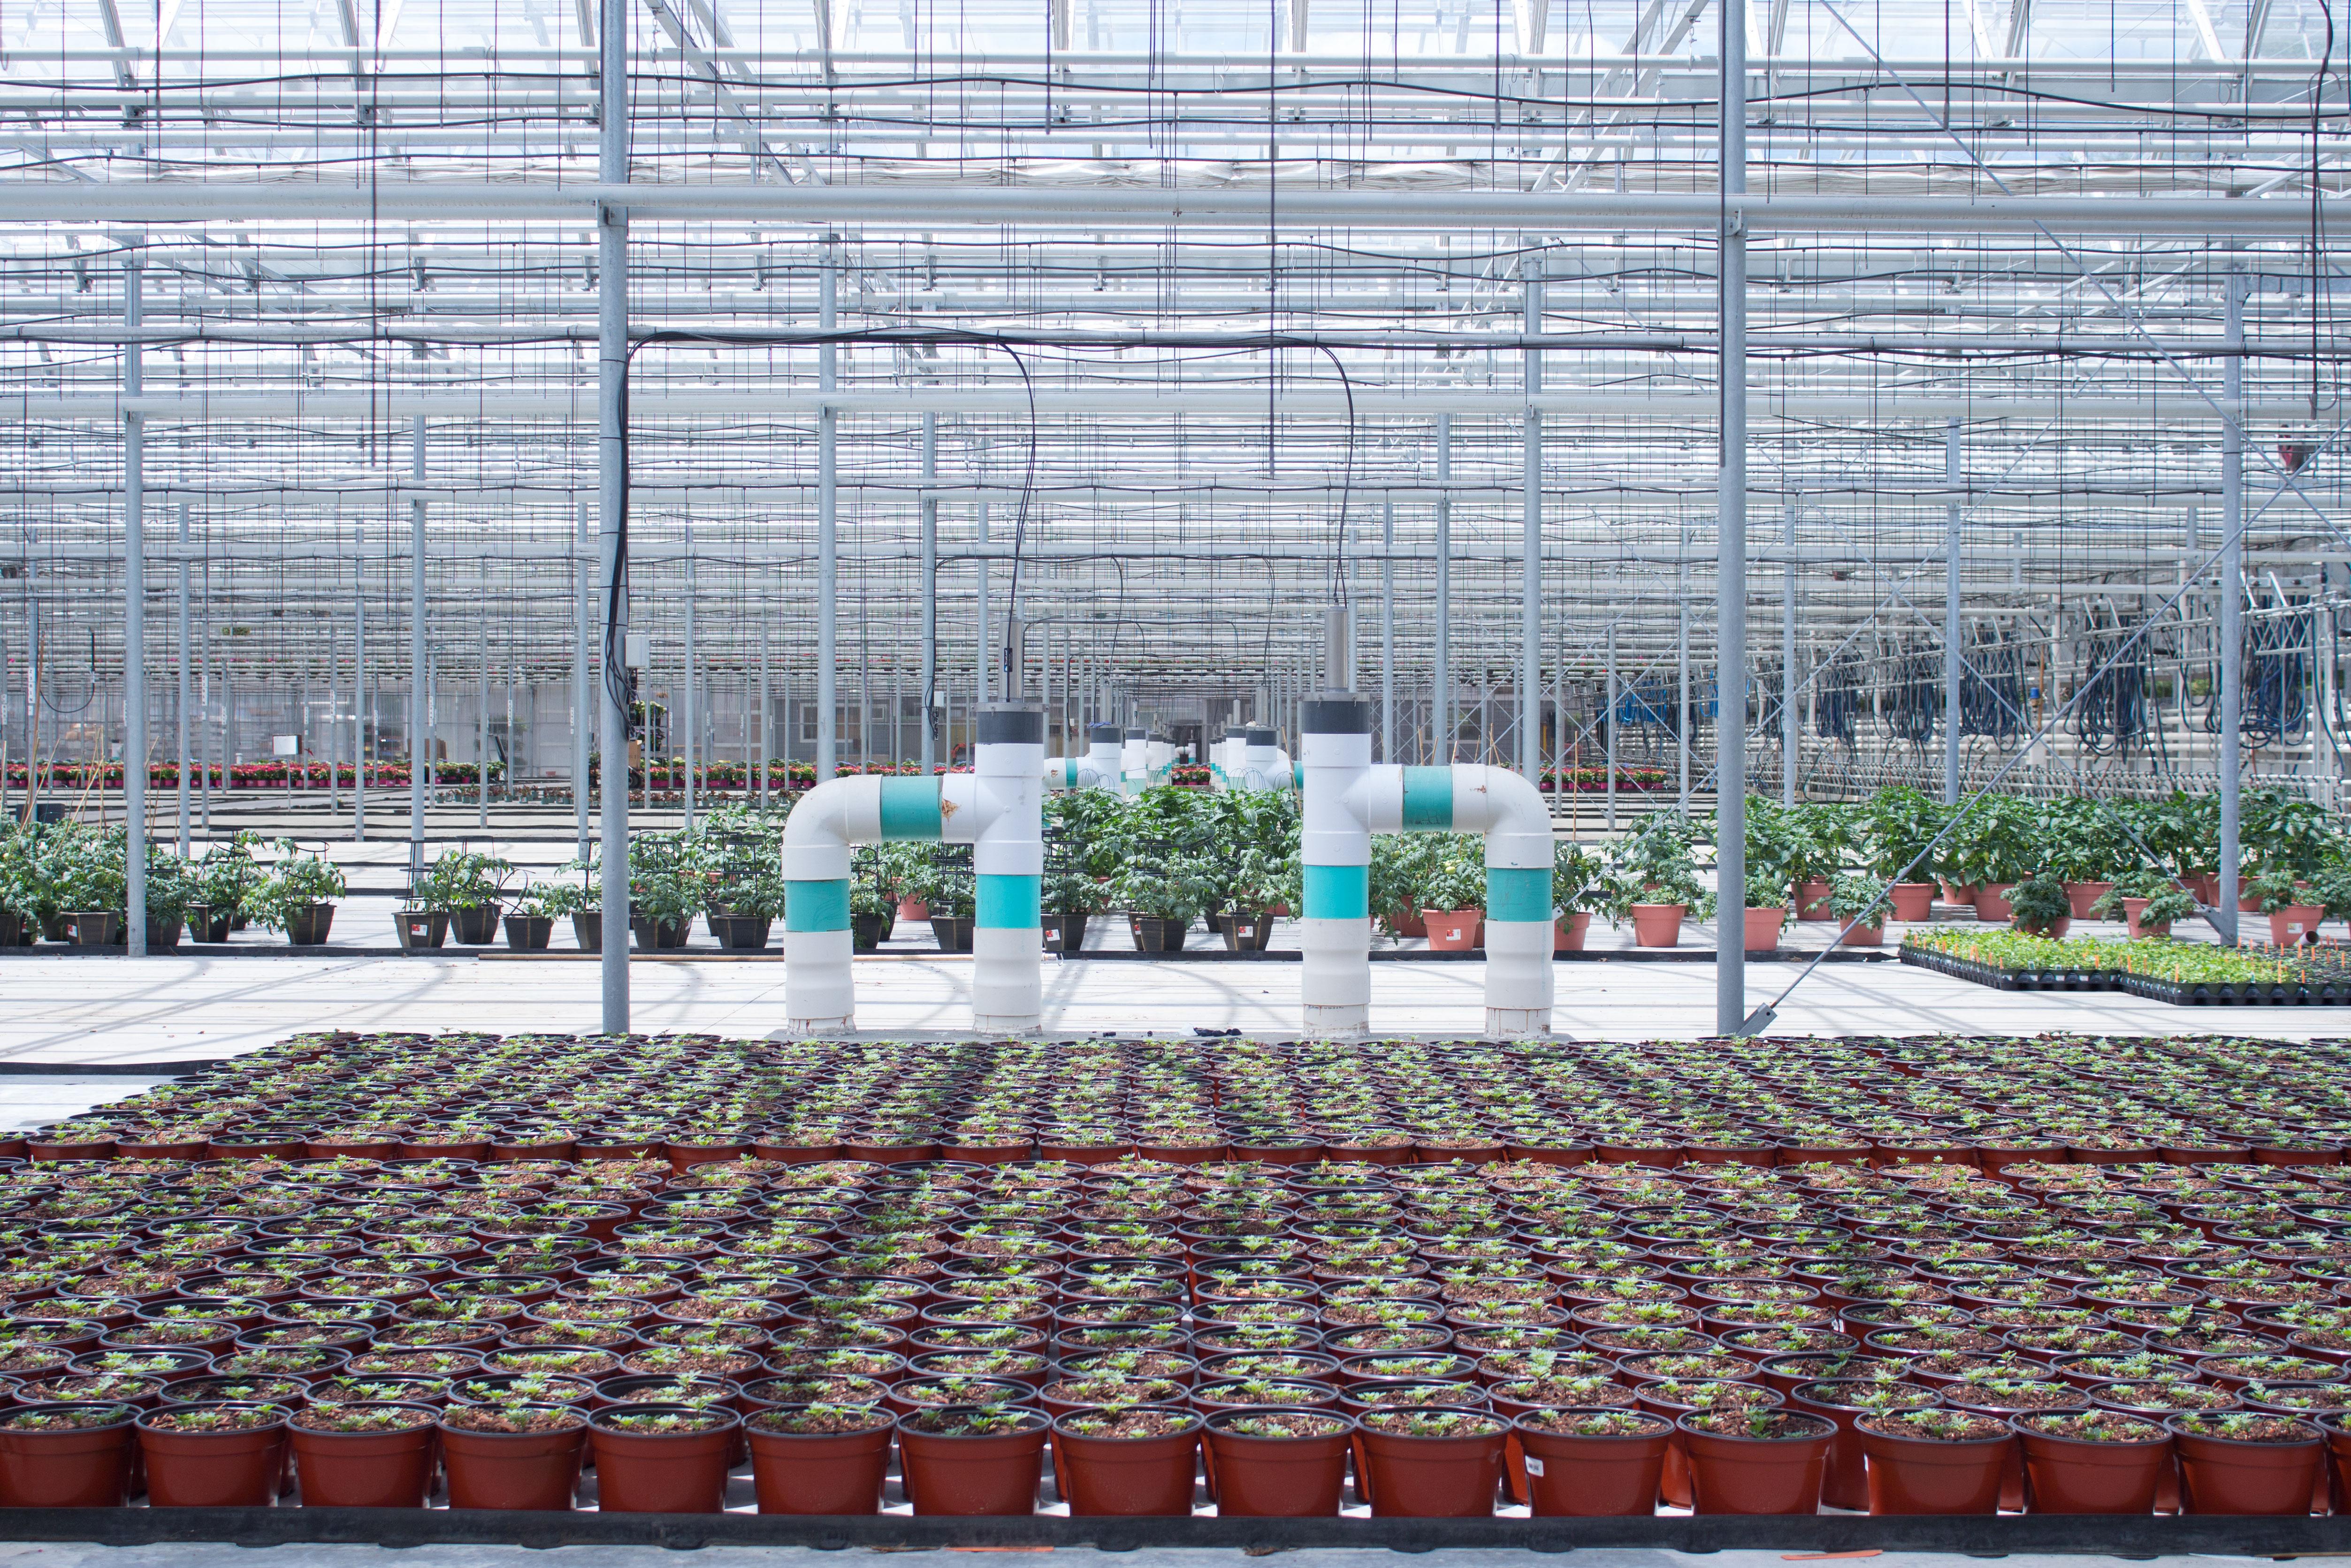 greenhouse with fertigation system